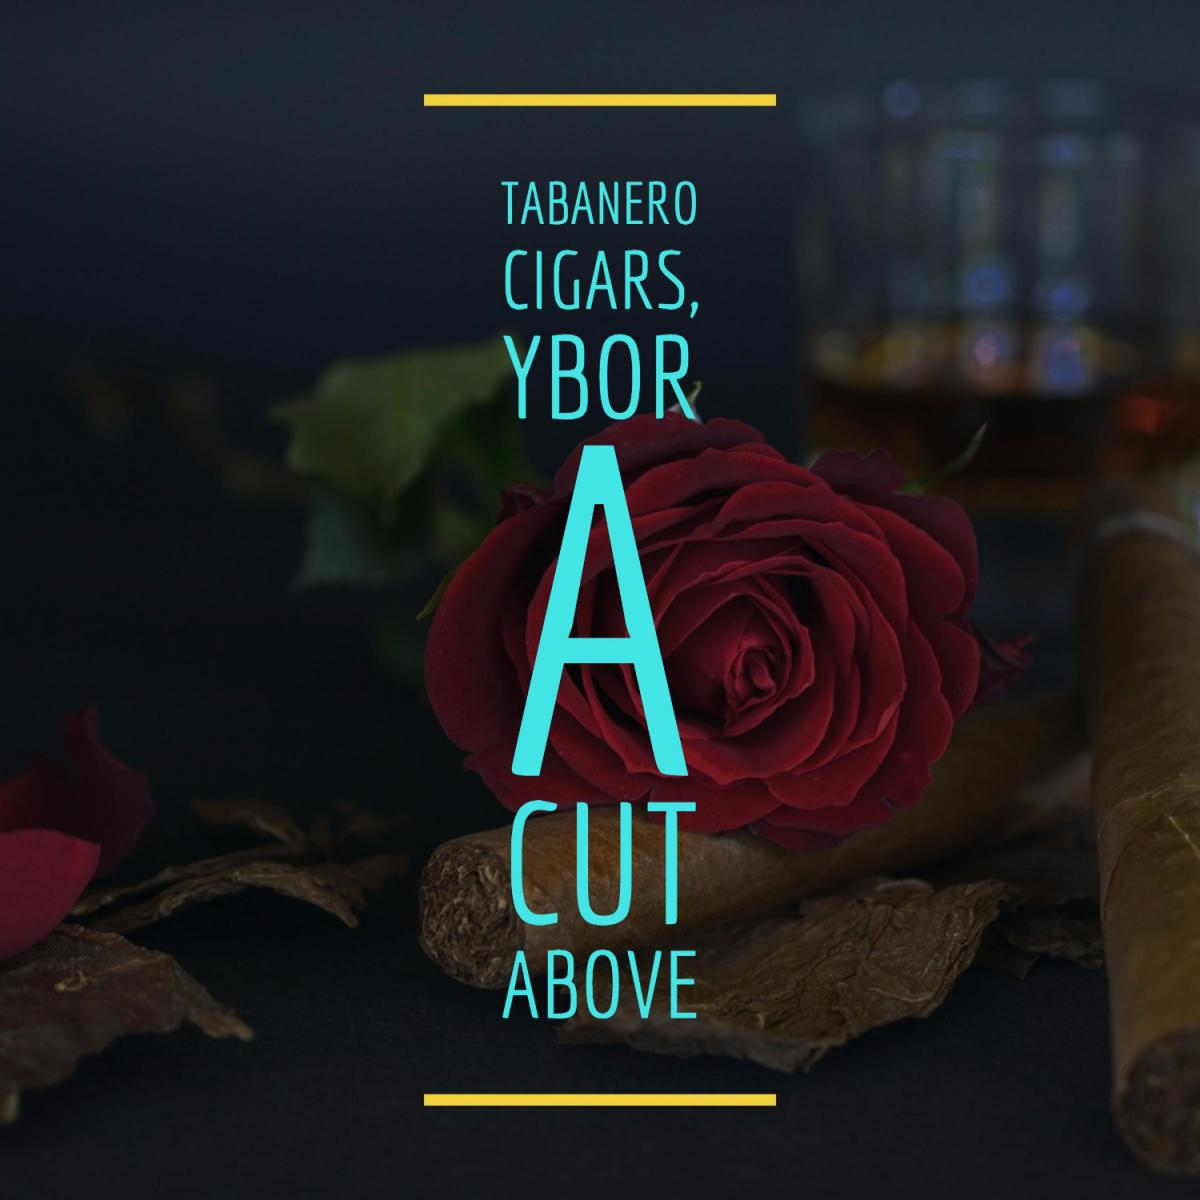 Focus on Ybor | Meet Tabanero Cigars Passionate Owner, Yanko